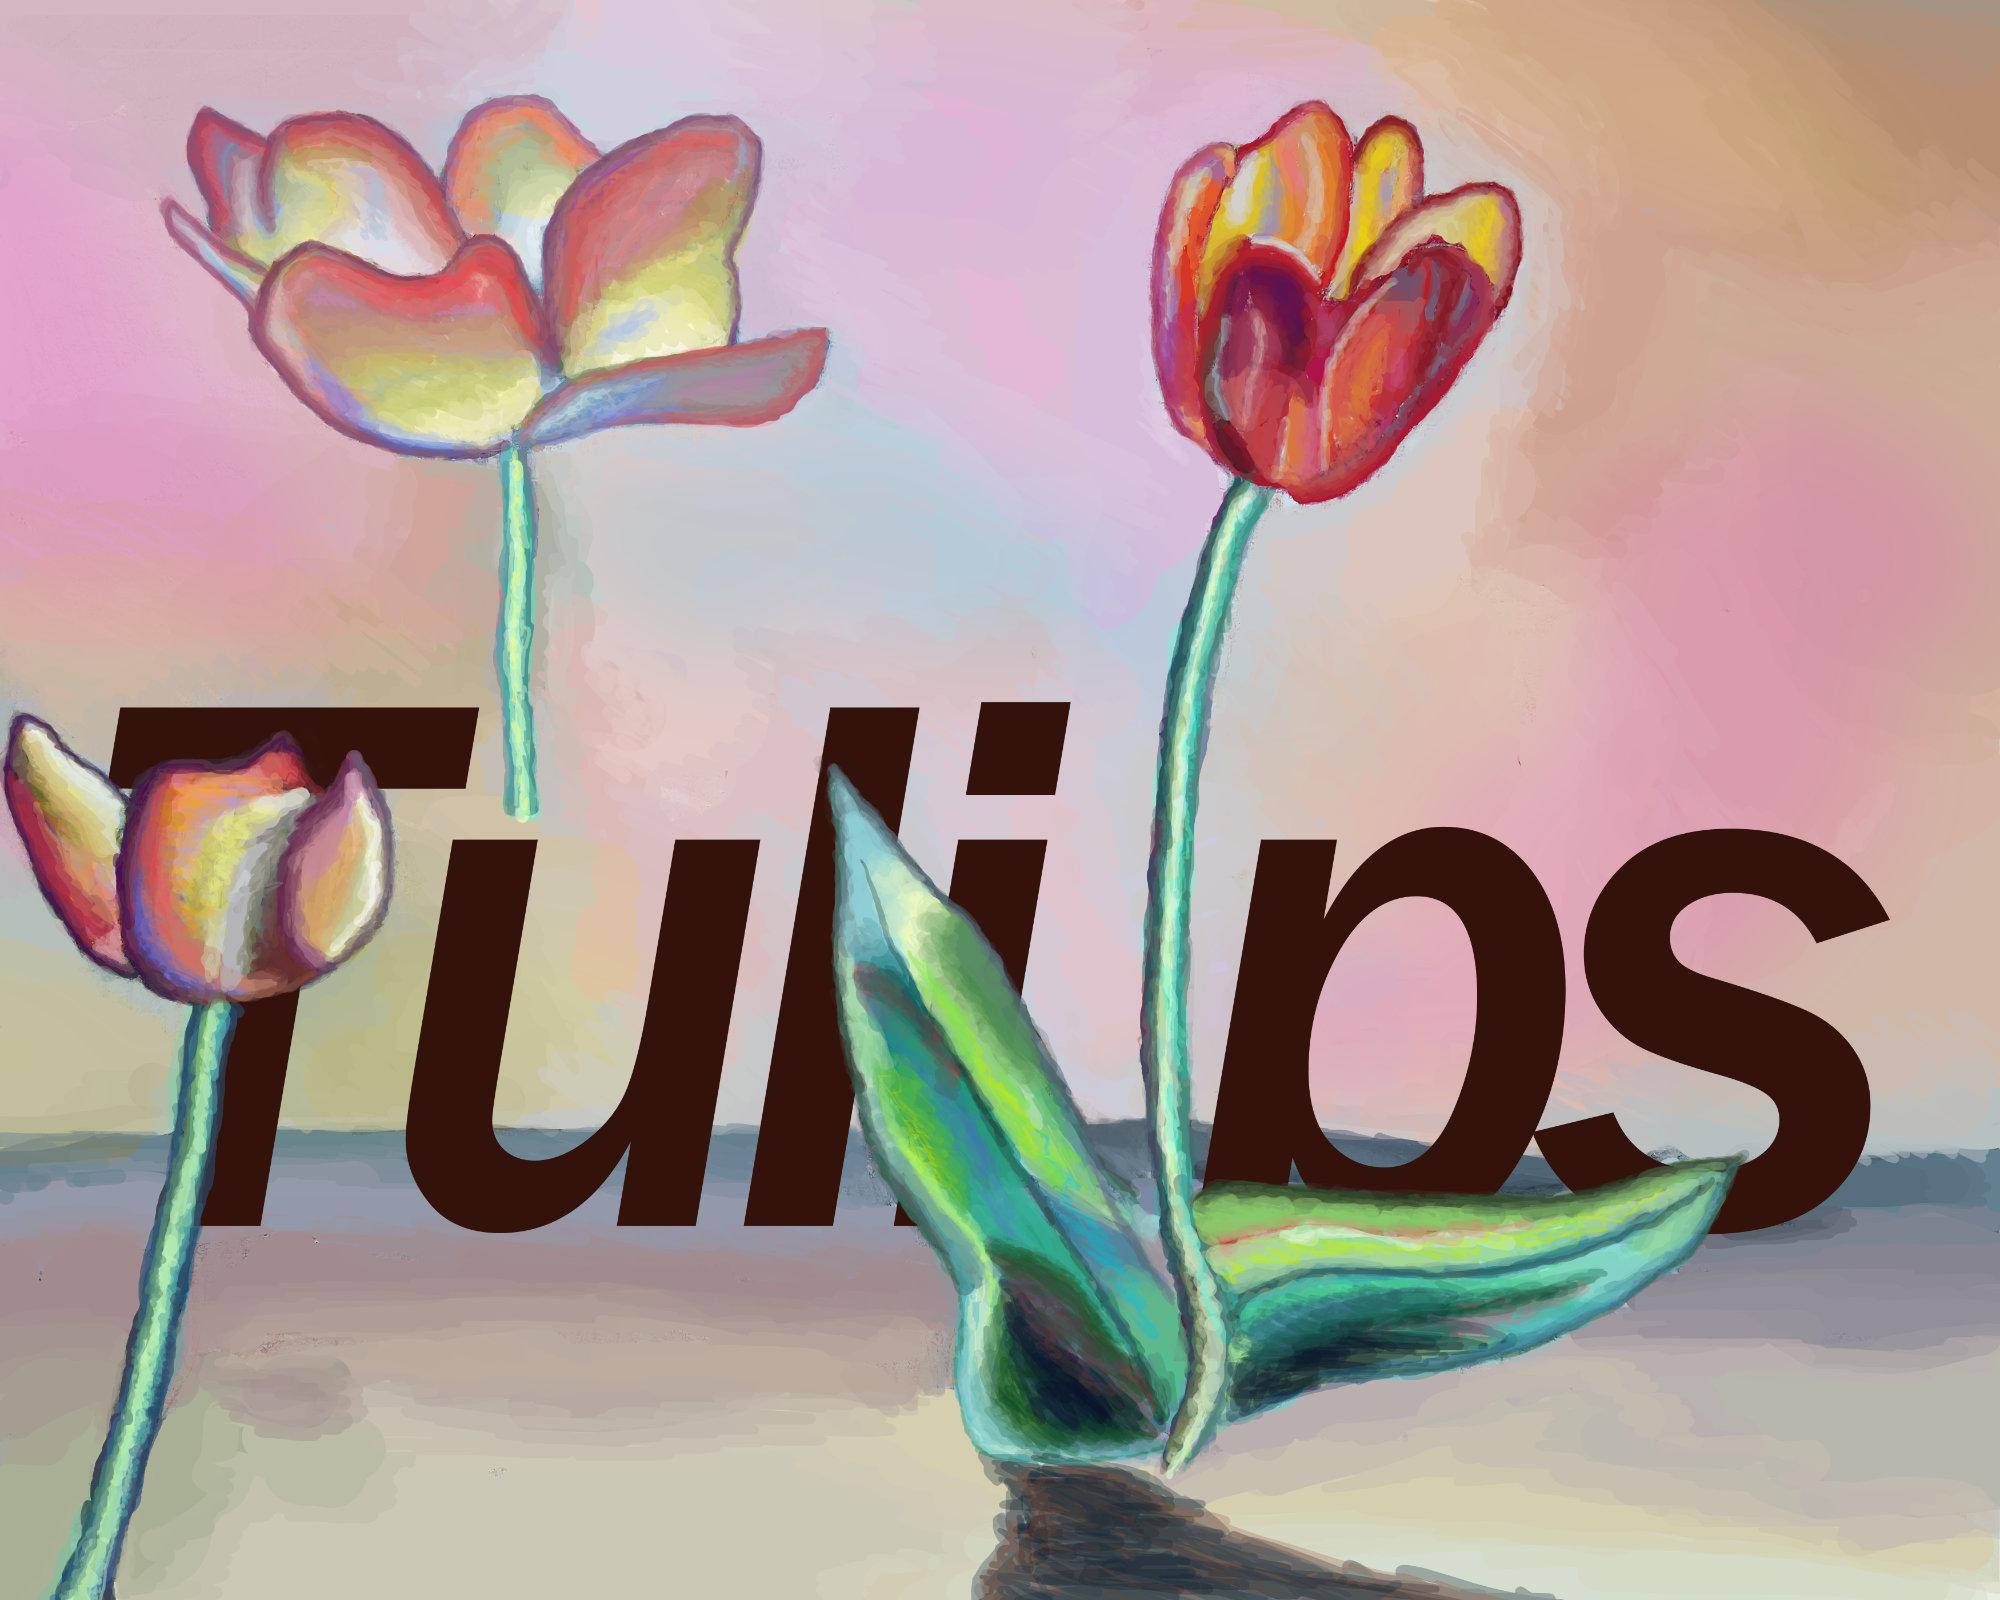 Tulipsv6_Text_proof_ul